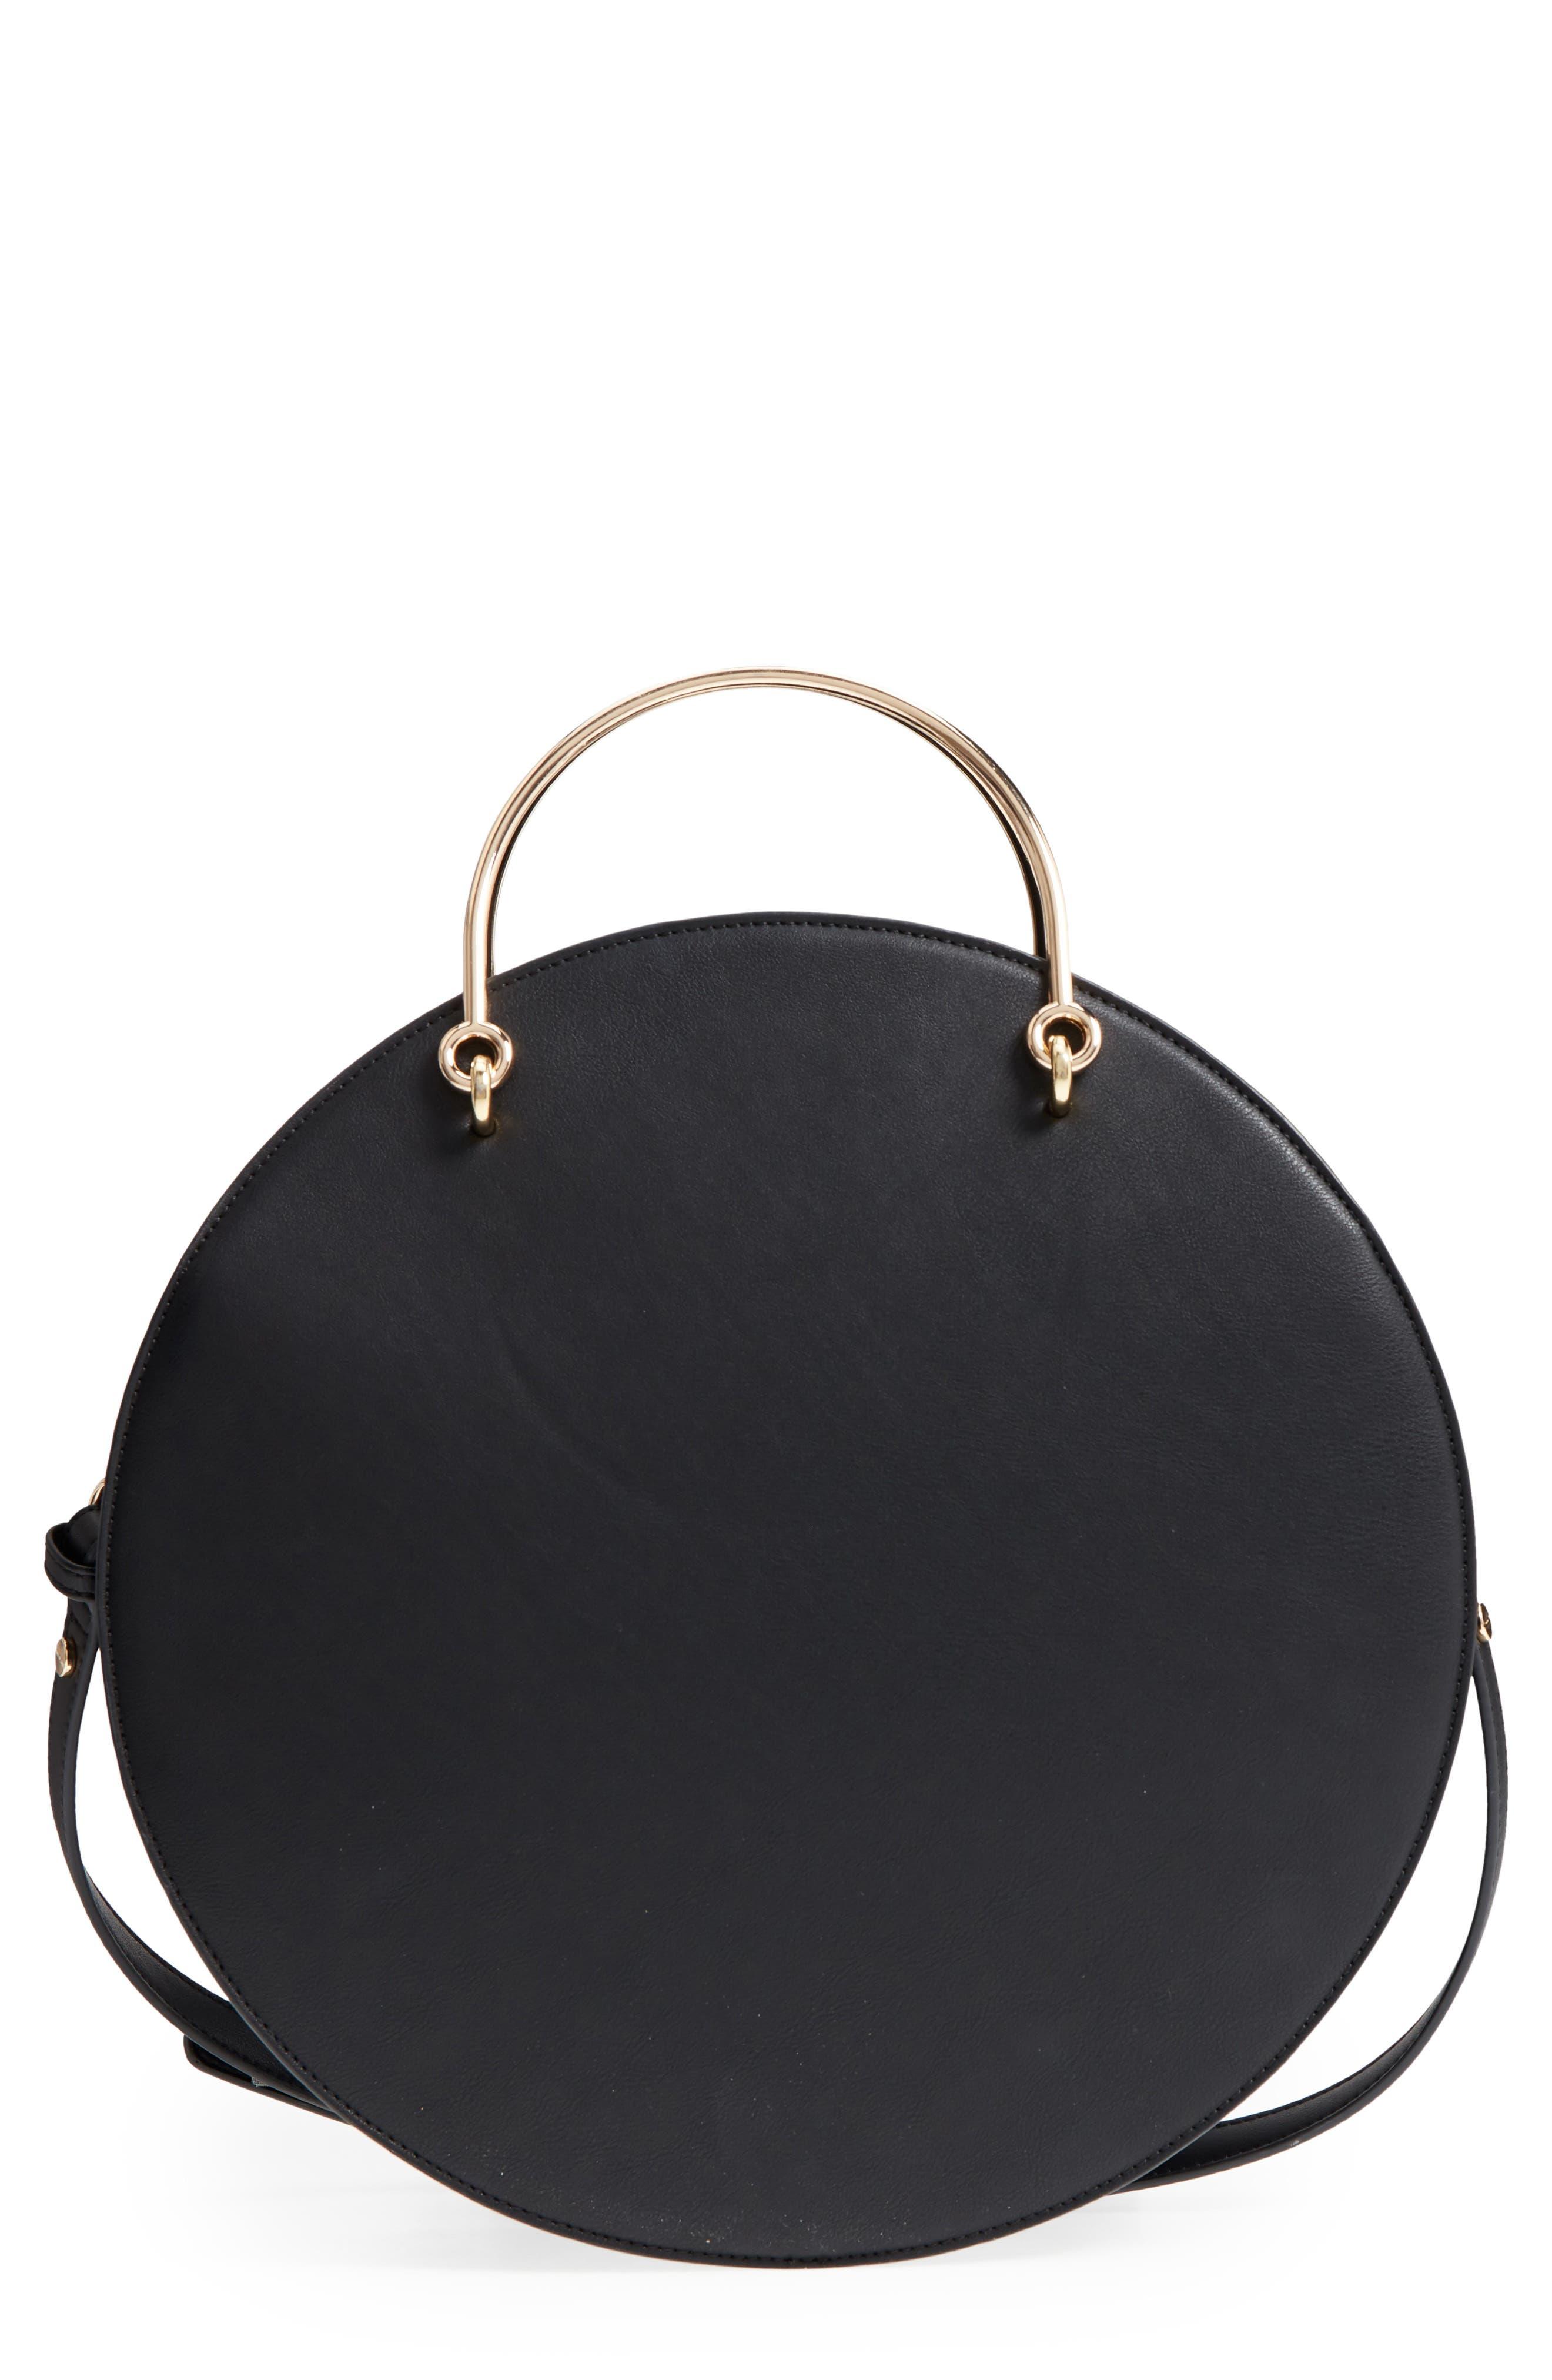 Mali + Lili Vegan Leather Round Top Handle Bag,                             Main thumbnail 1, color,                             001